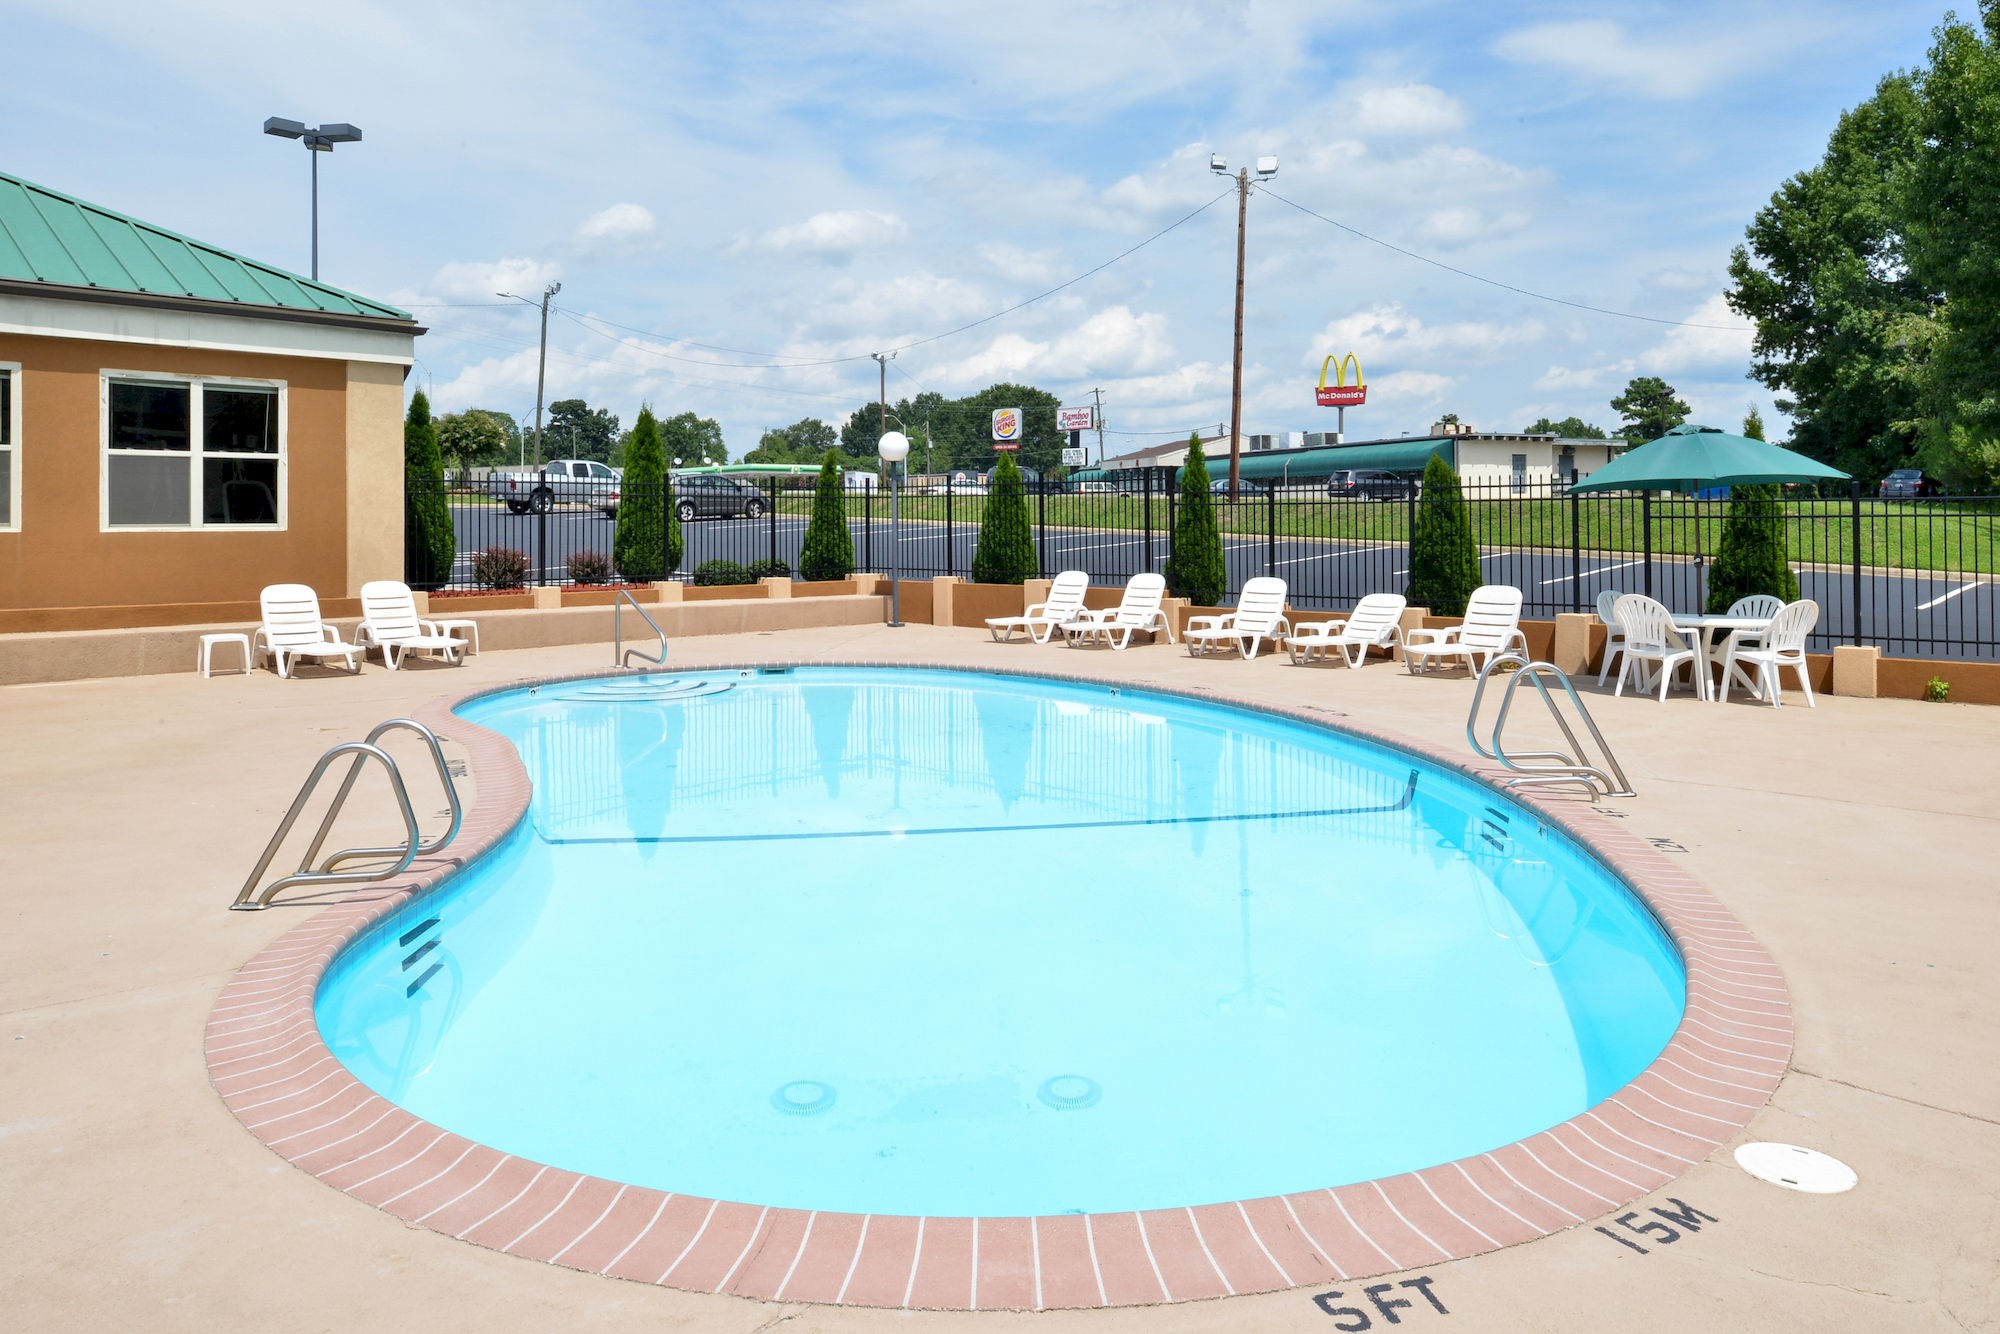 Comfort Inn Asheboro in Asheboro, NC